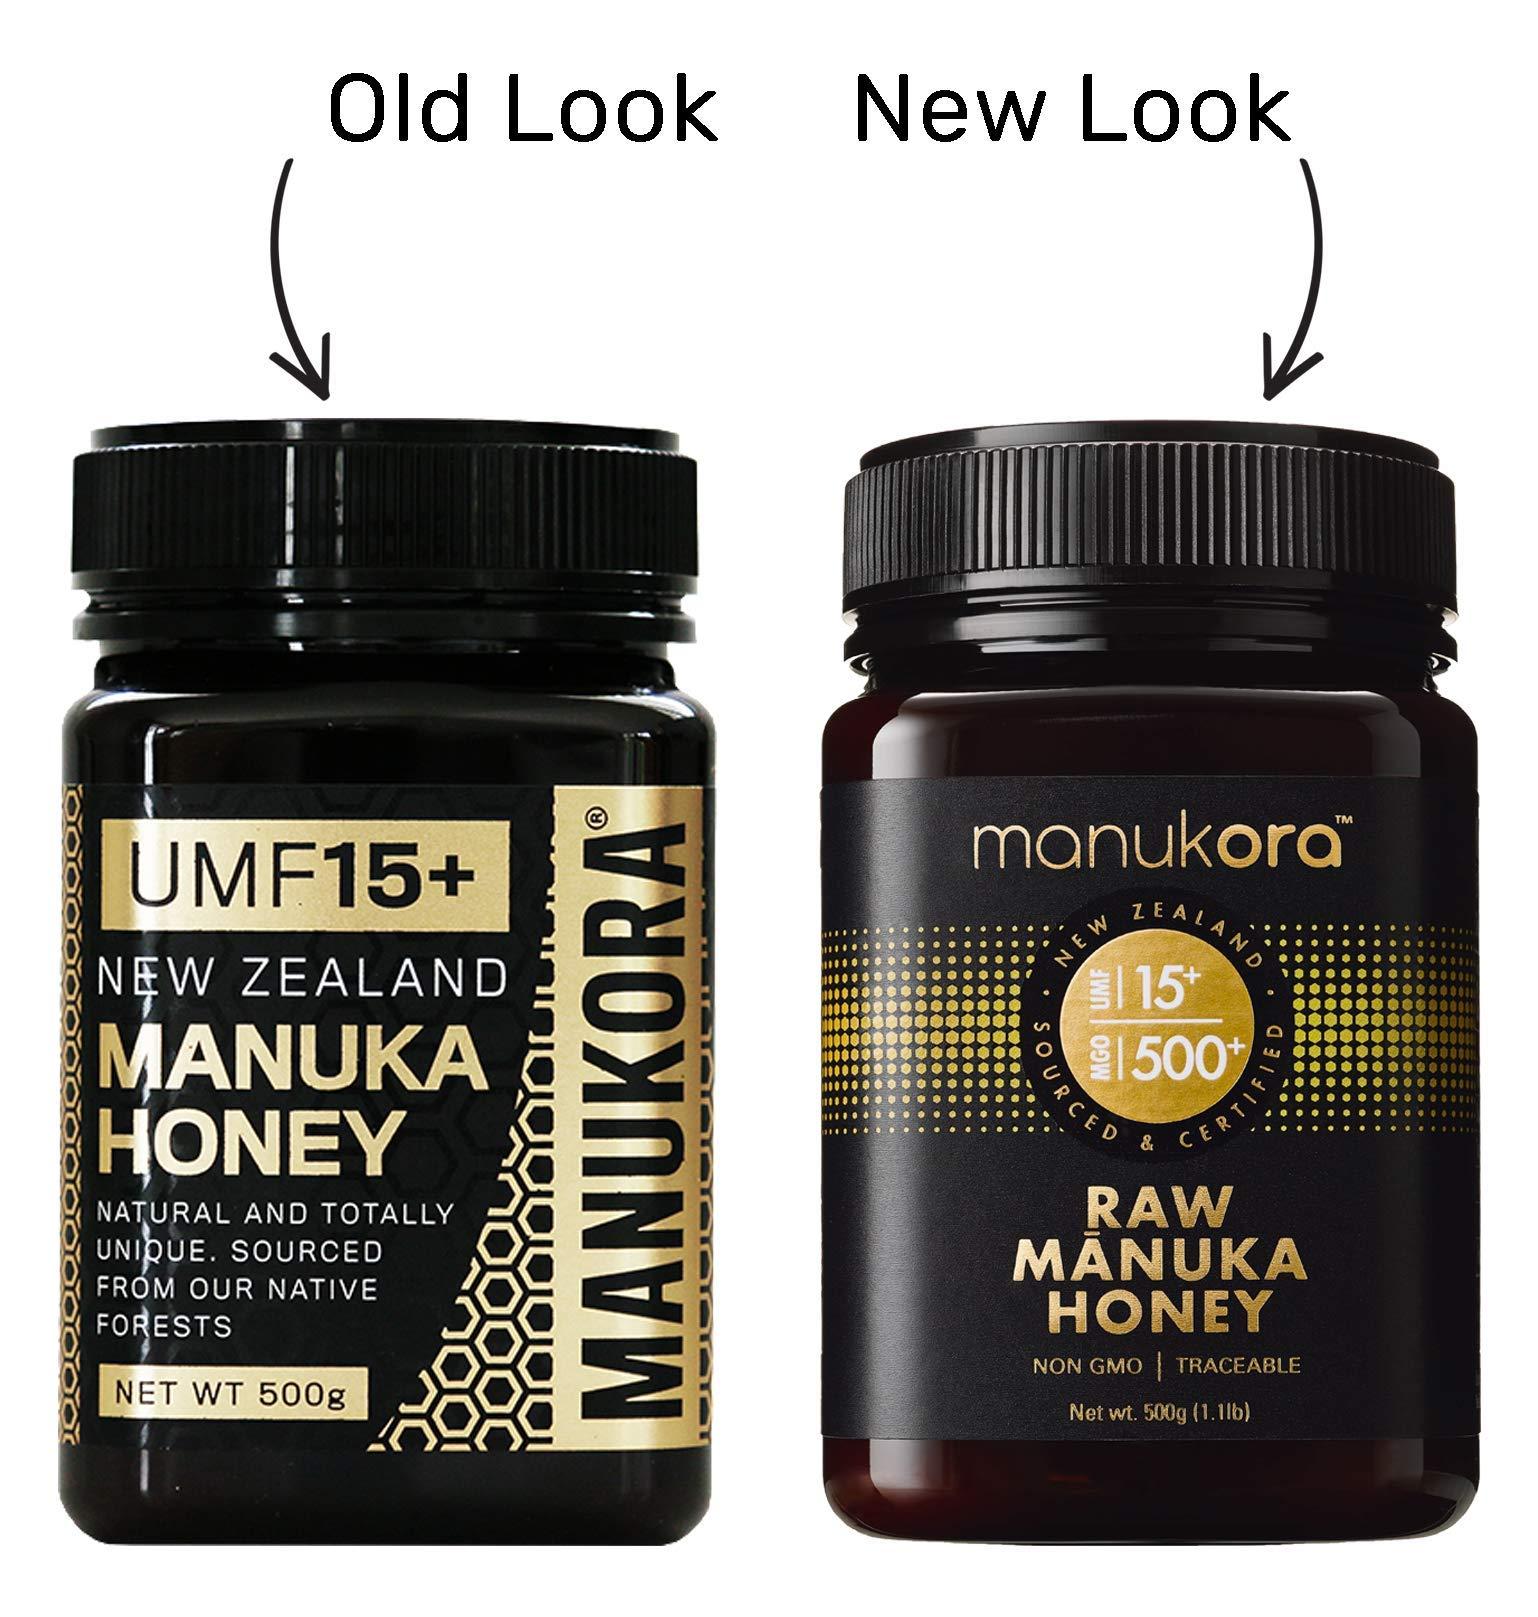 Manukora UMF 15+/MGO 500+ Raw Mānuka Honey (500g/1.1lb) Authentic Non-GMO New Zealand Honey, UMF & MGO Certified, Traceable from Hive to Hand by Manukora (Image #6)